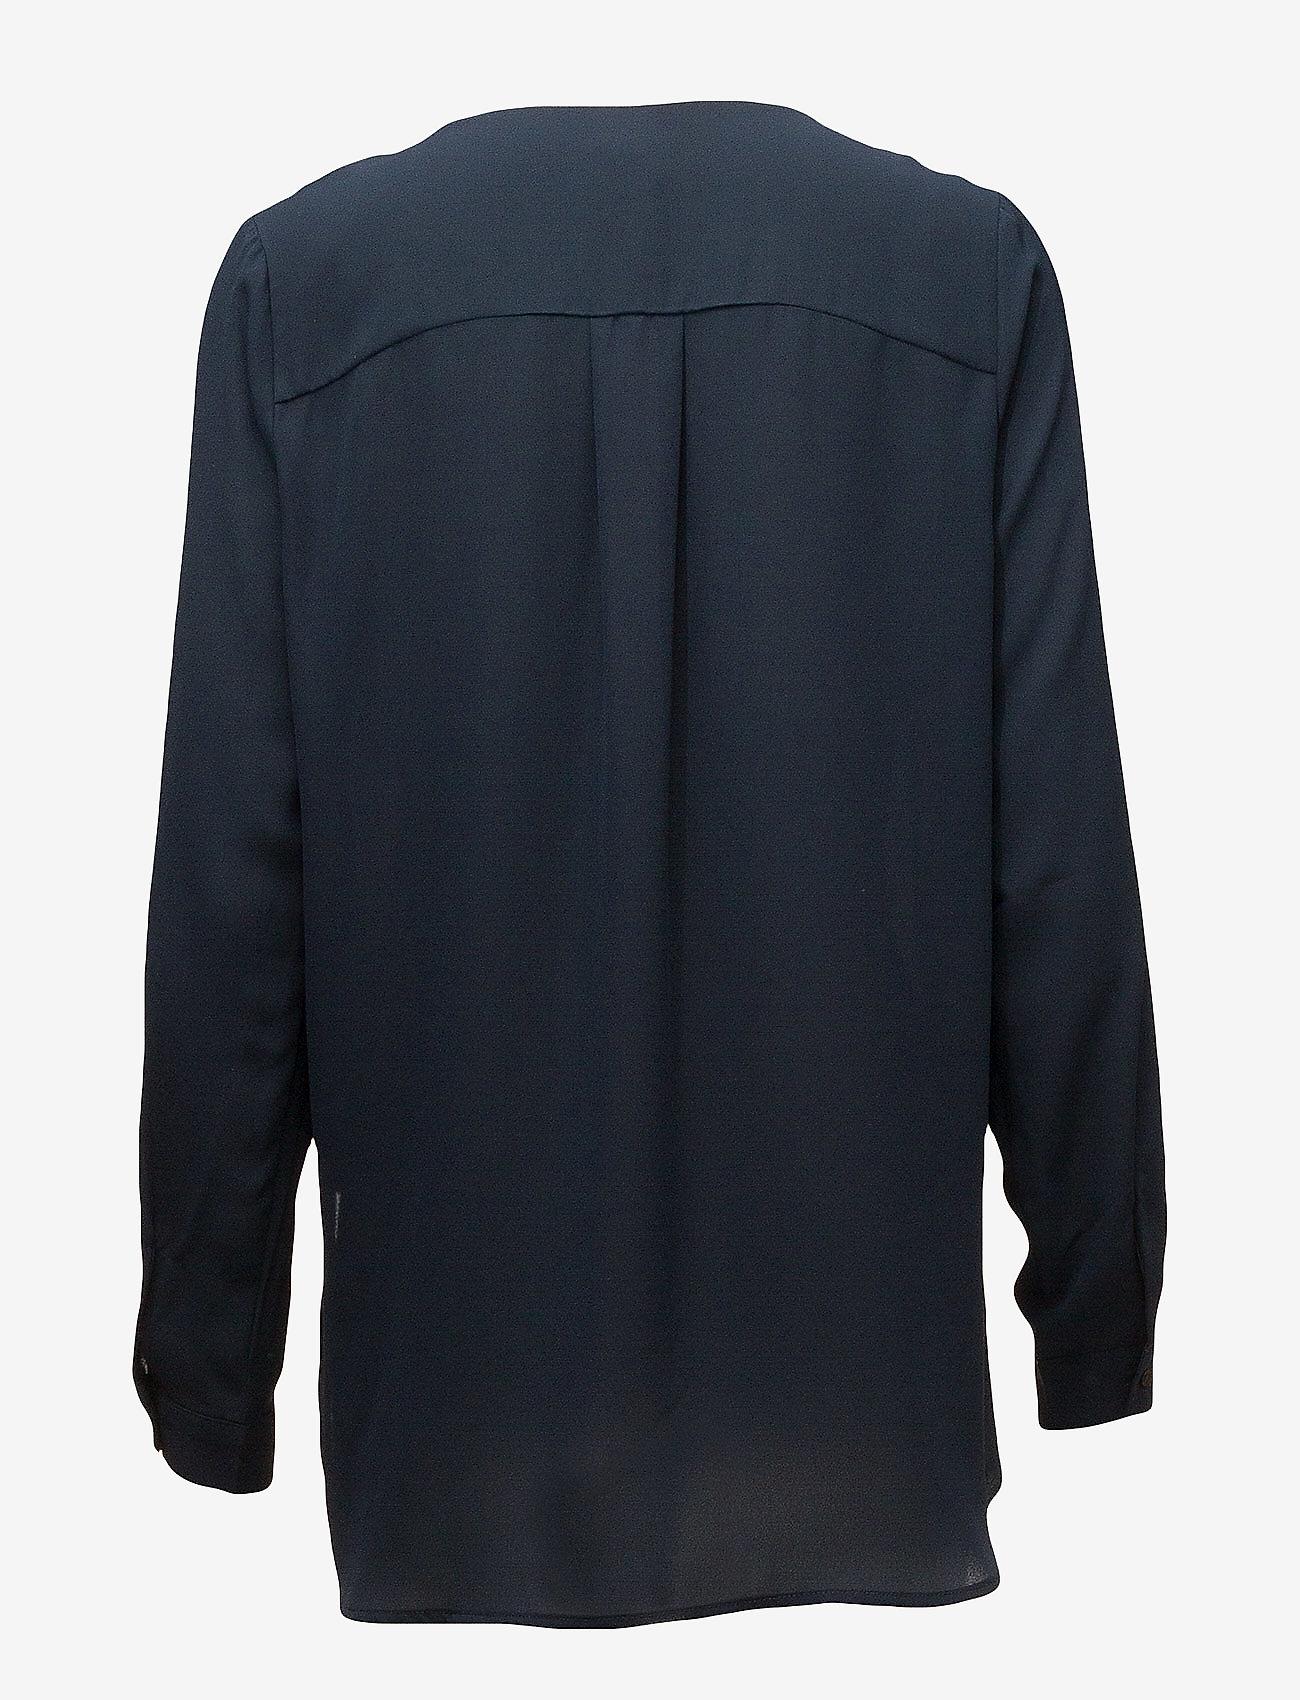 Selected Femme - SLFDYNELLA LS SHIRT NOOS - long sleeved blouses - navy blazer - 1